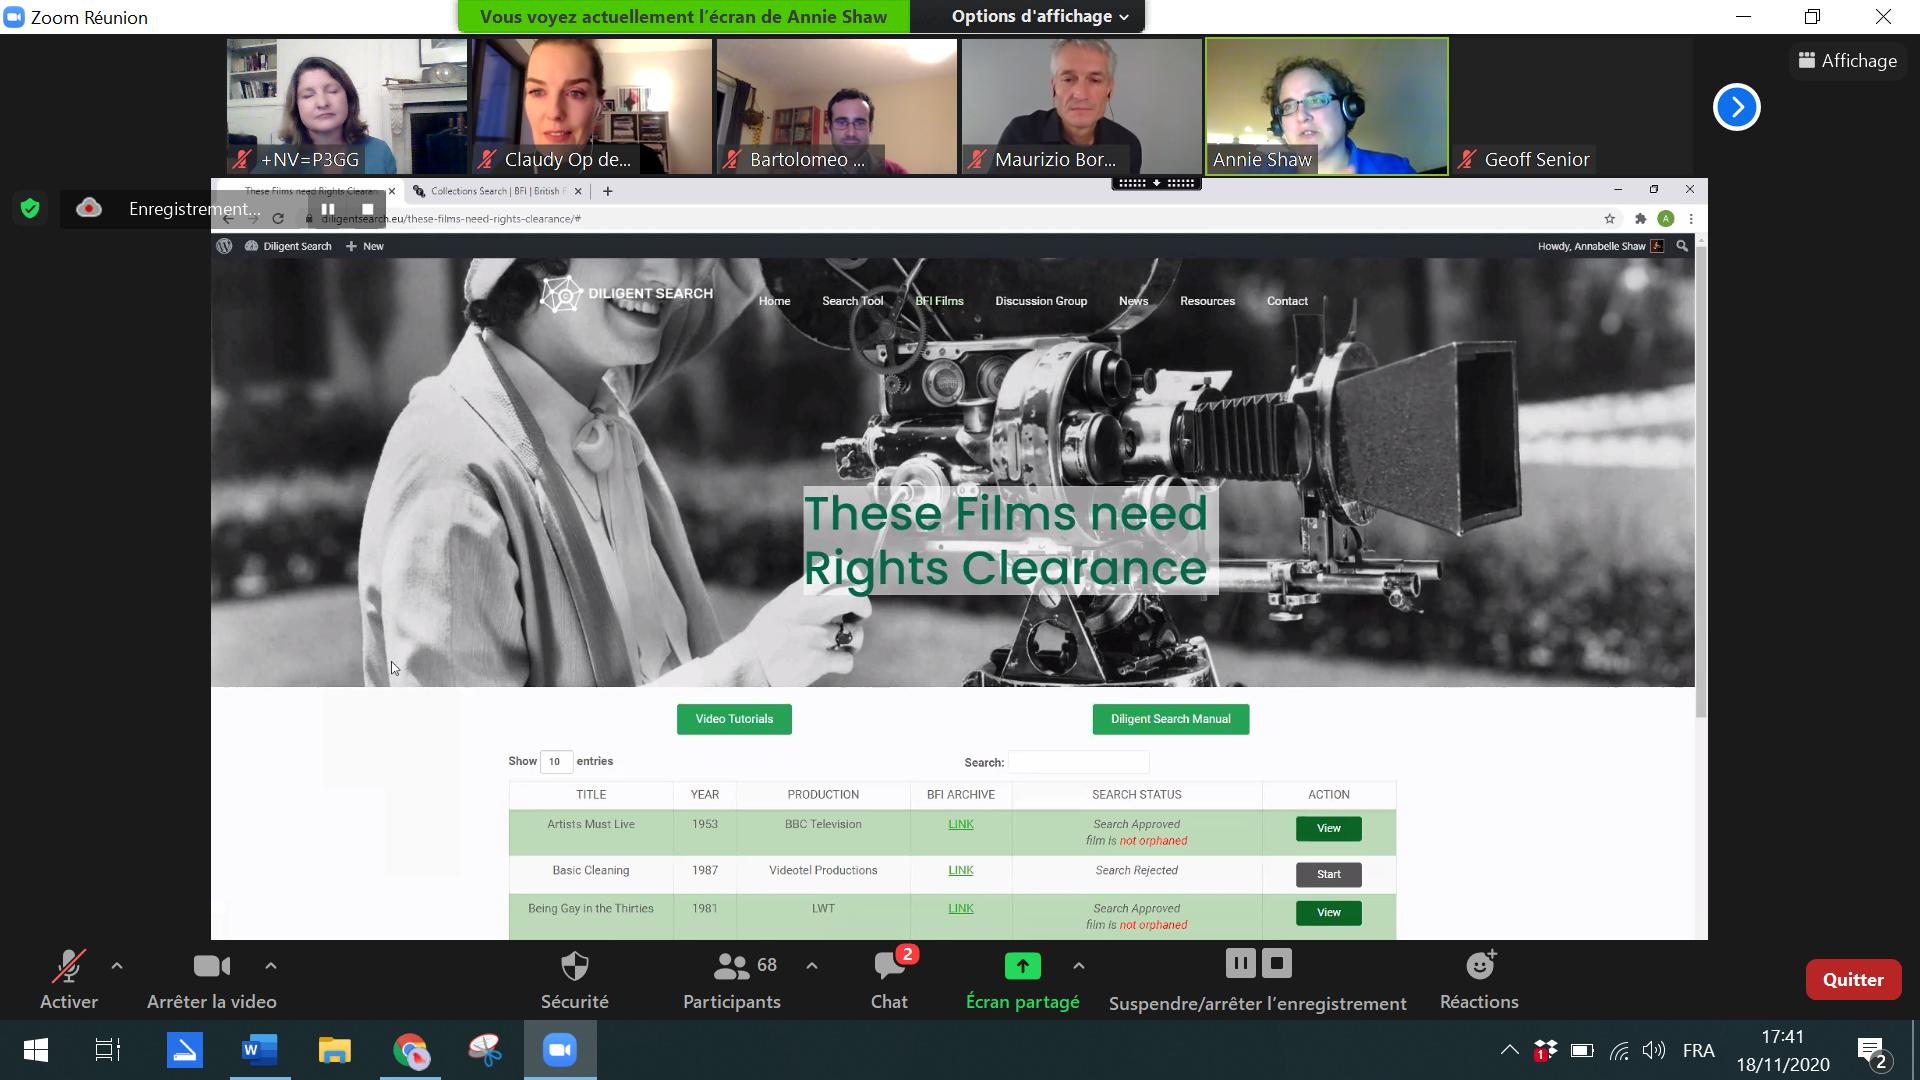 Capture d'écran 2020-11-18 17.41.35